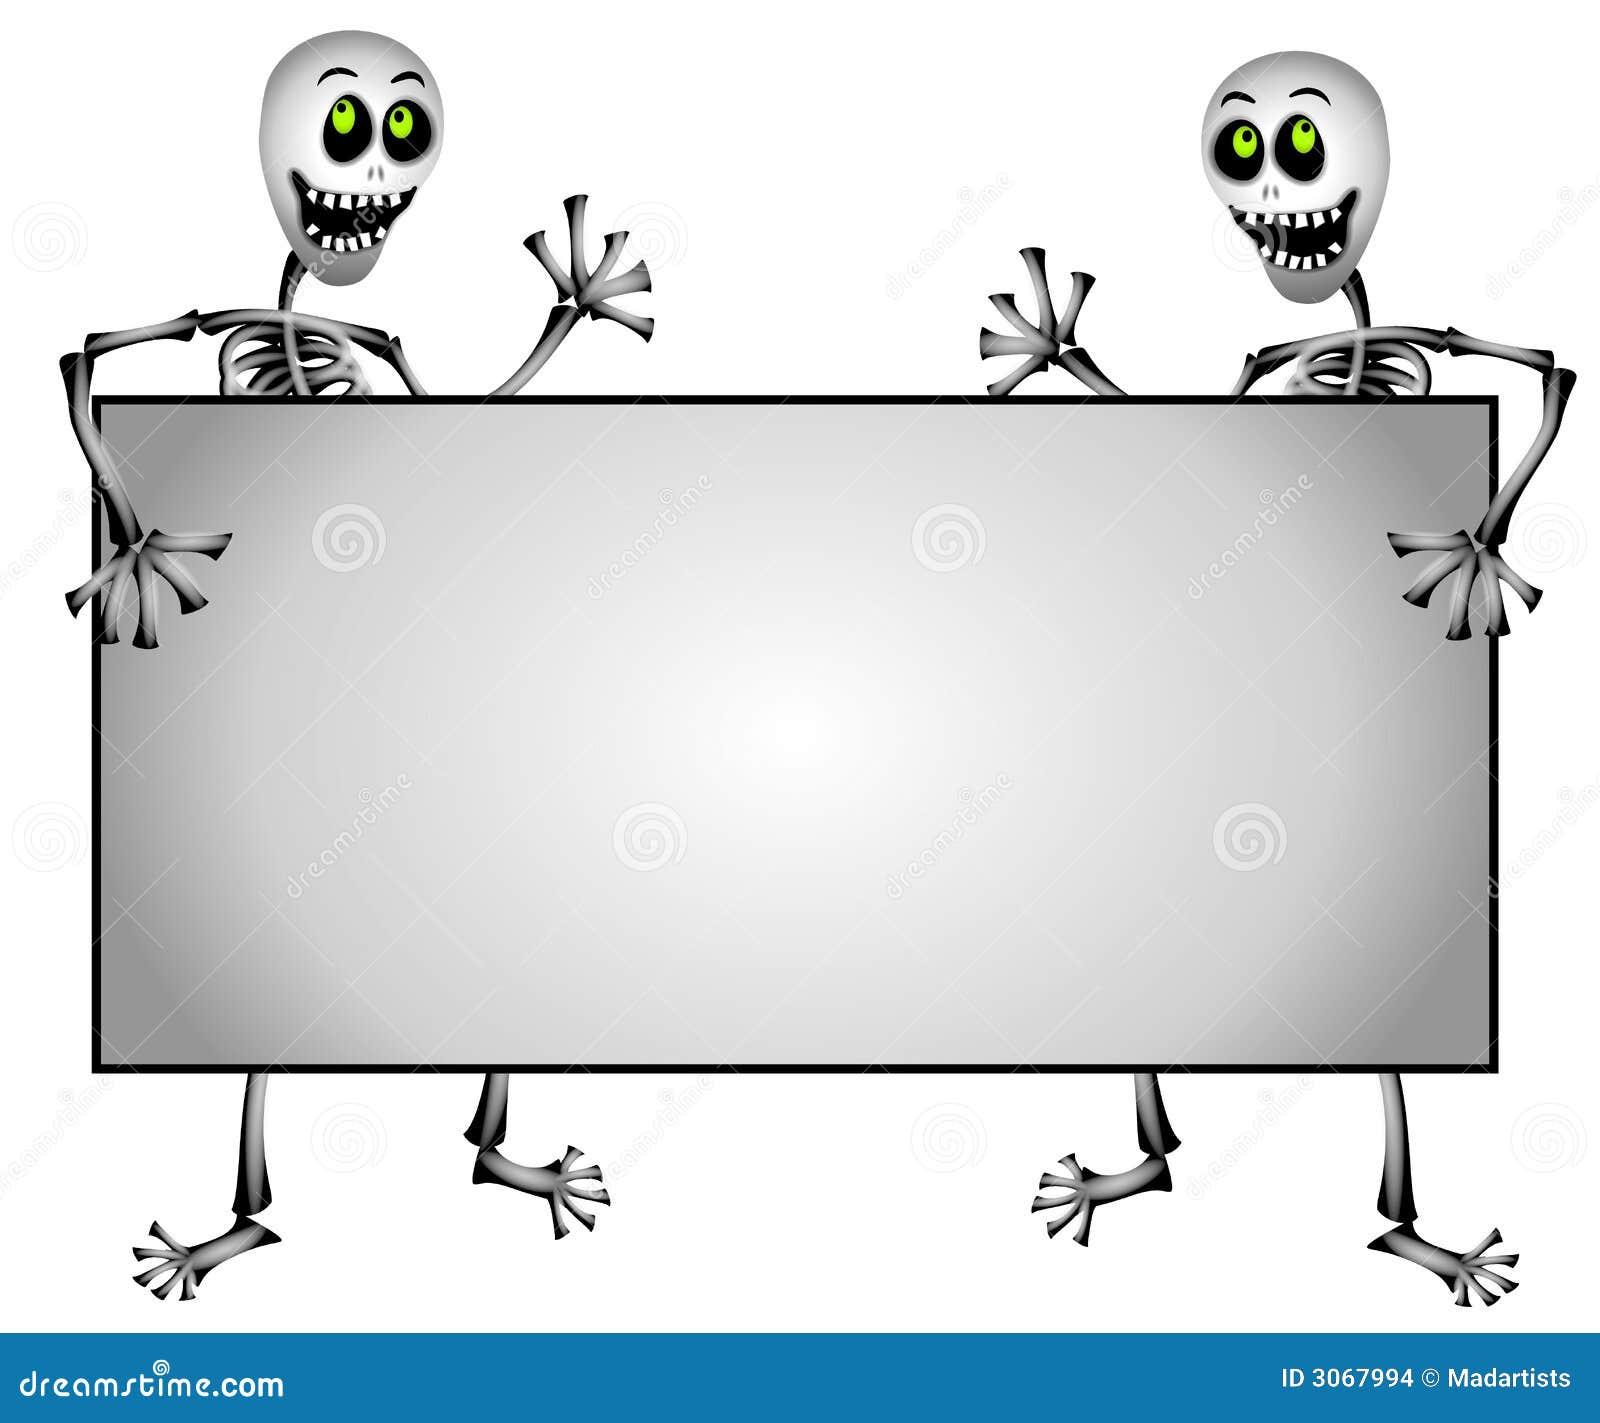 Skeletons Holding Blank Sign Stock Illustration Illustration Of